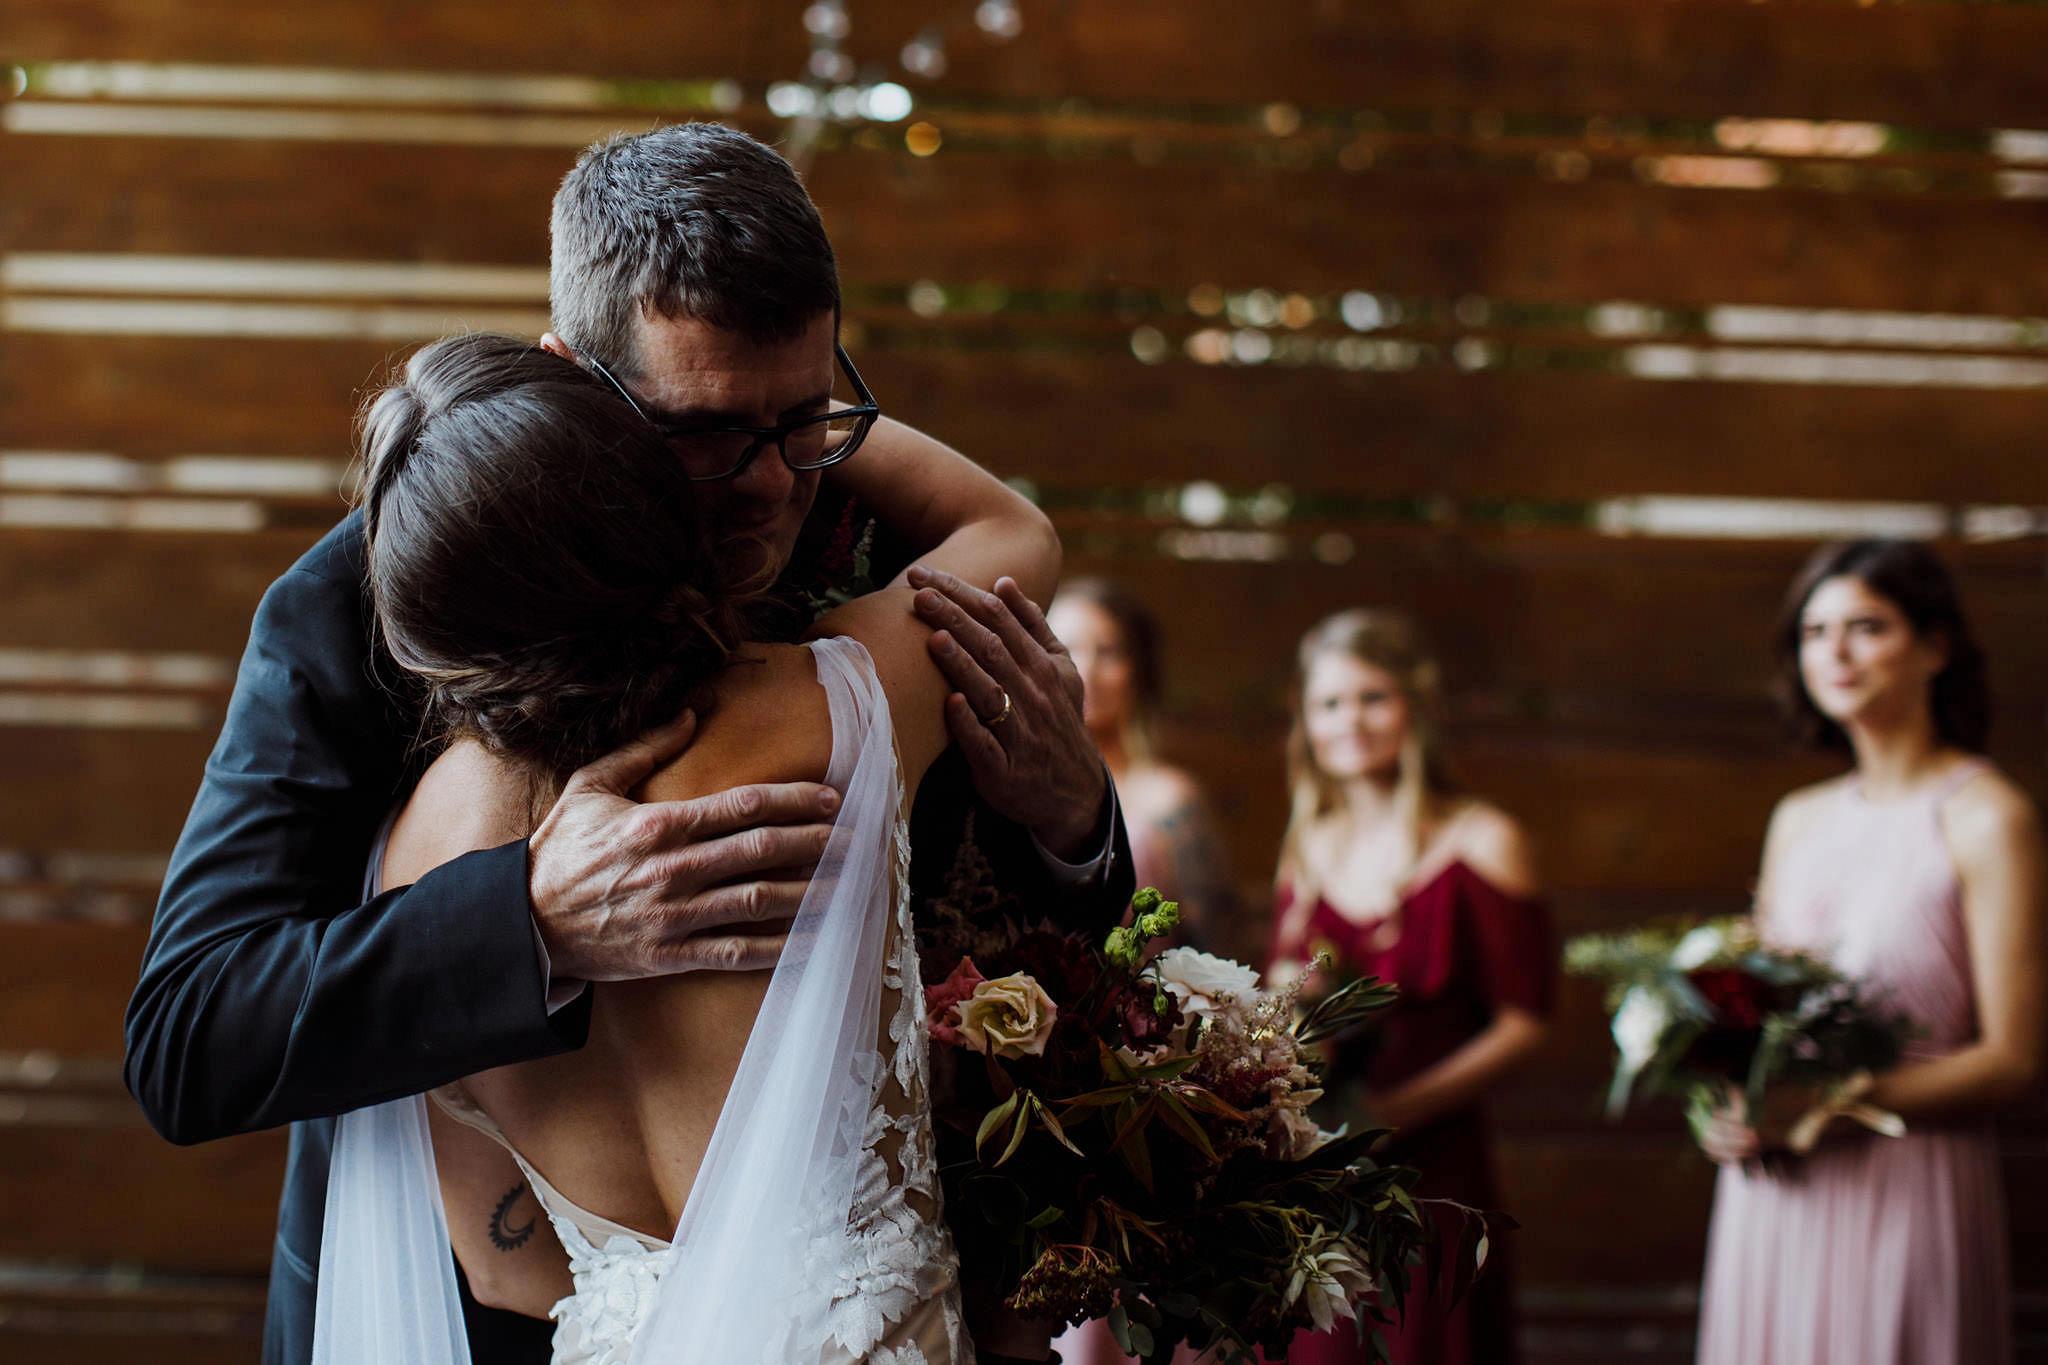 Feast of Fancy-Hobbs Building Wedding_Cinder Block Brewery Wedding_Kindling Wedding Photography_06.JPG